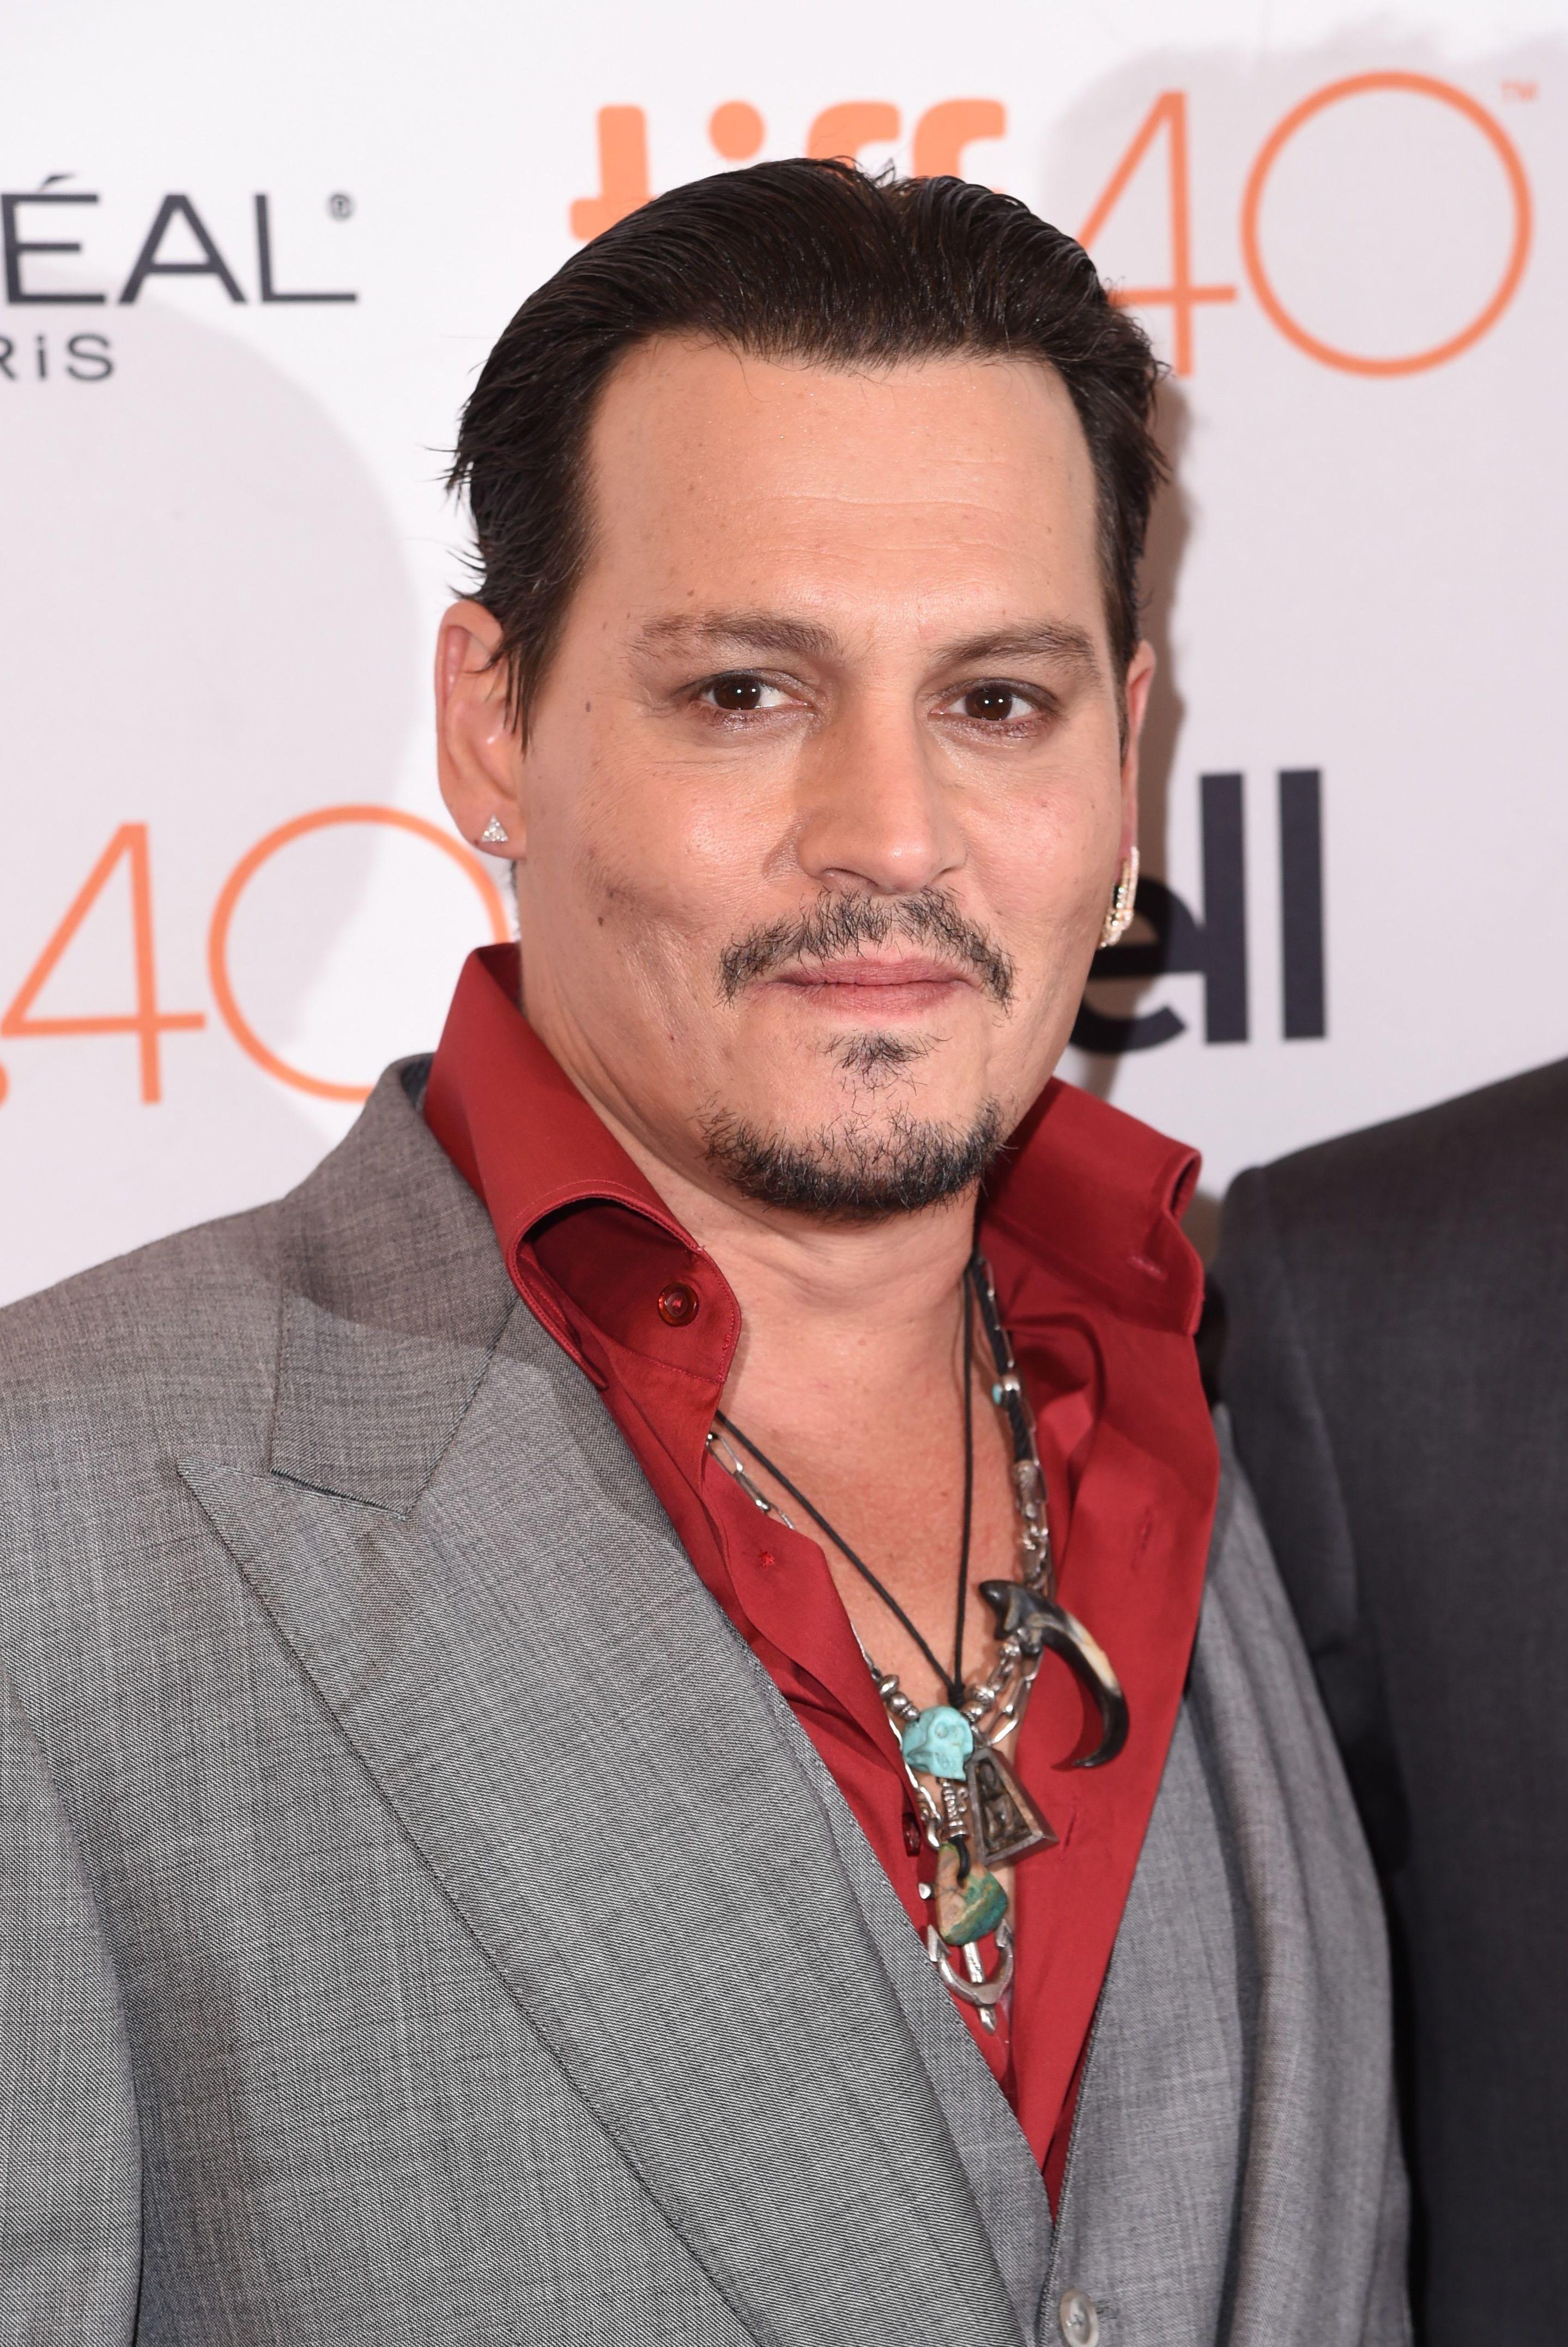 Johnny Depp | Bio | Wonderwall.com